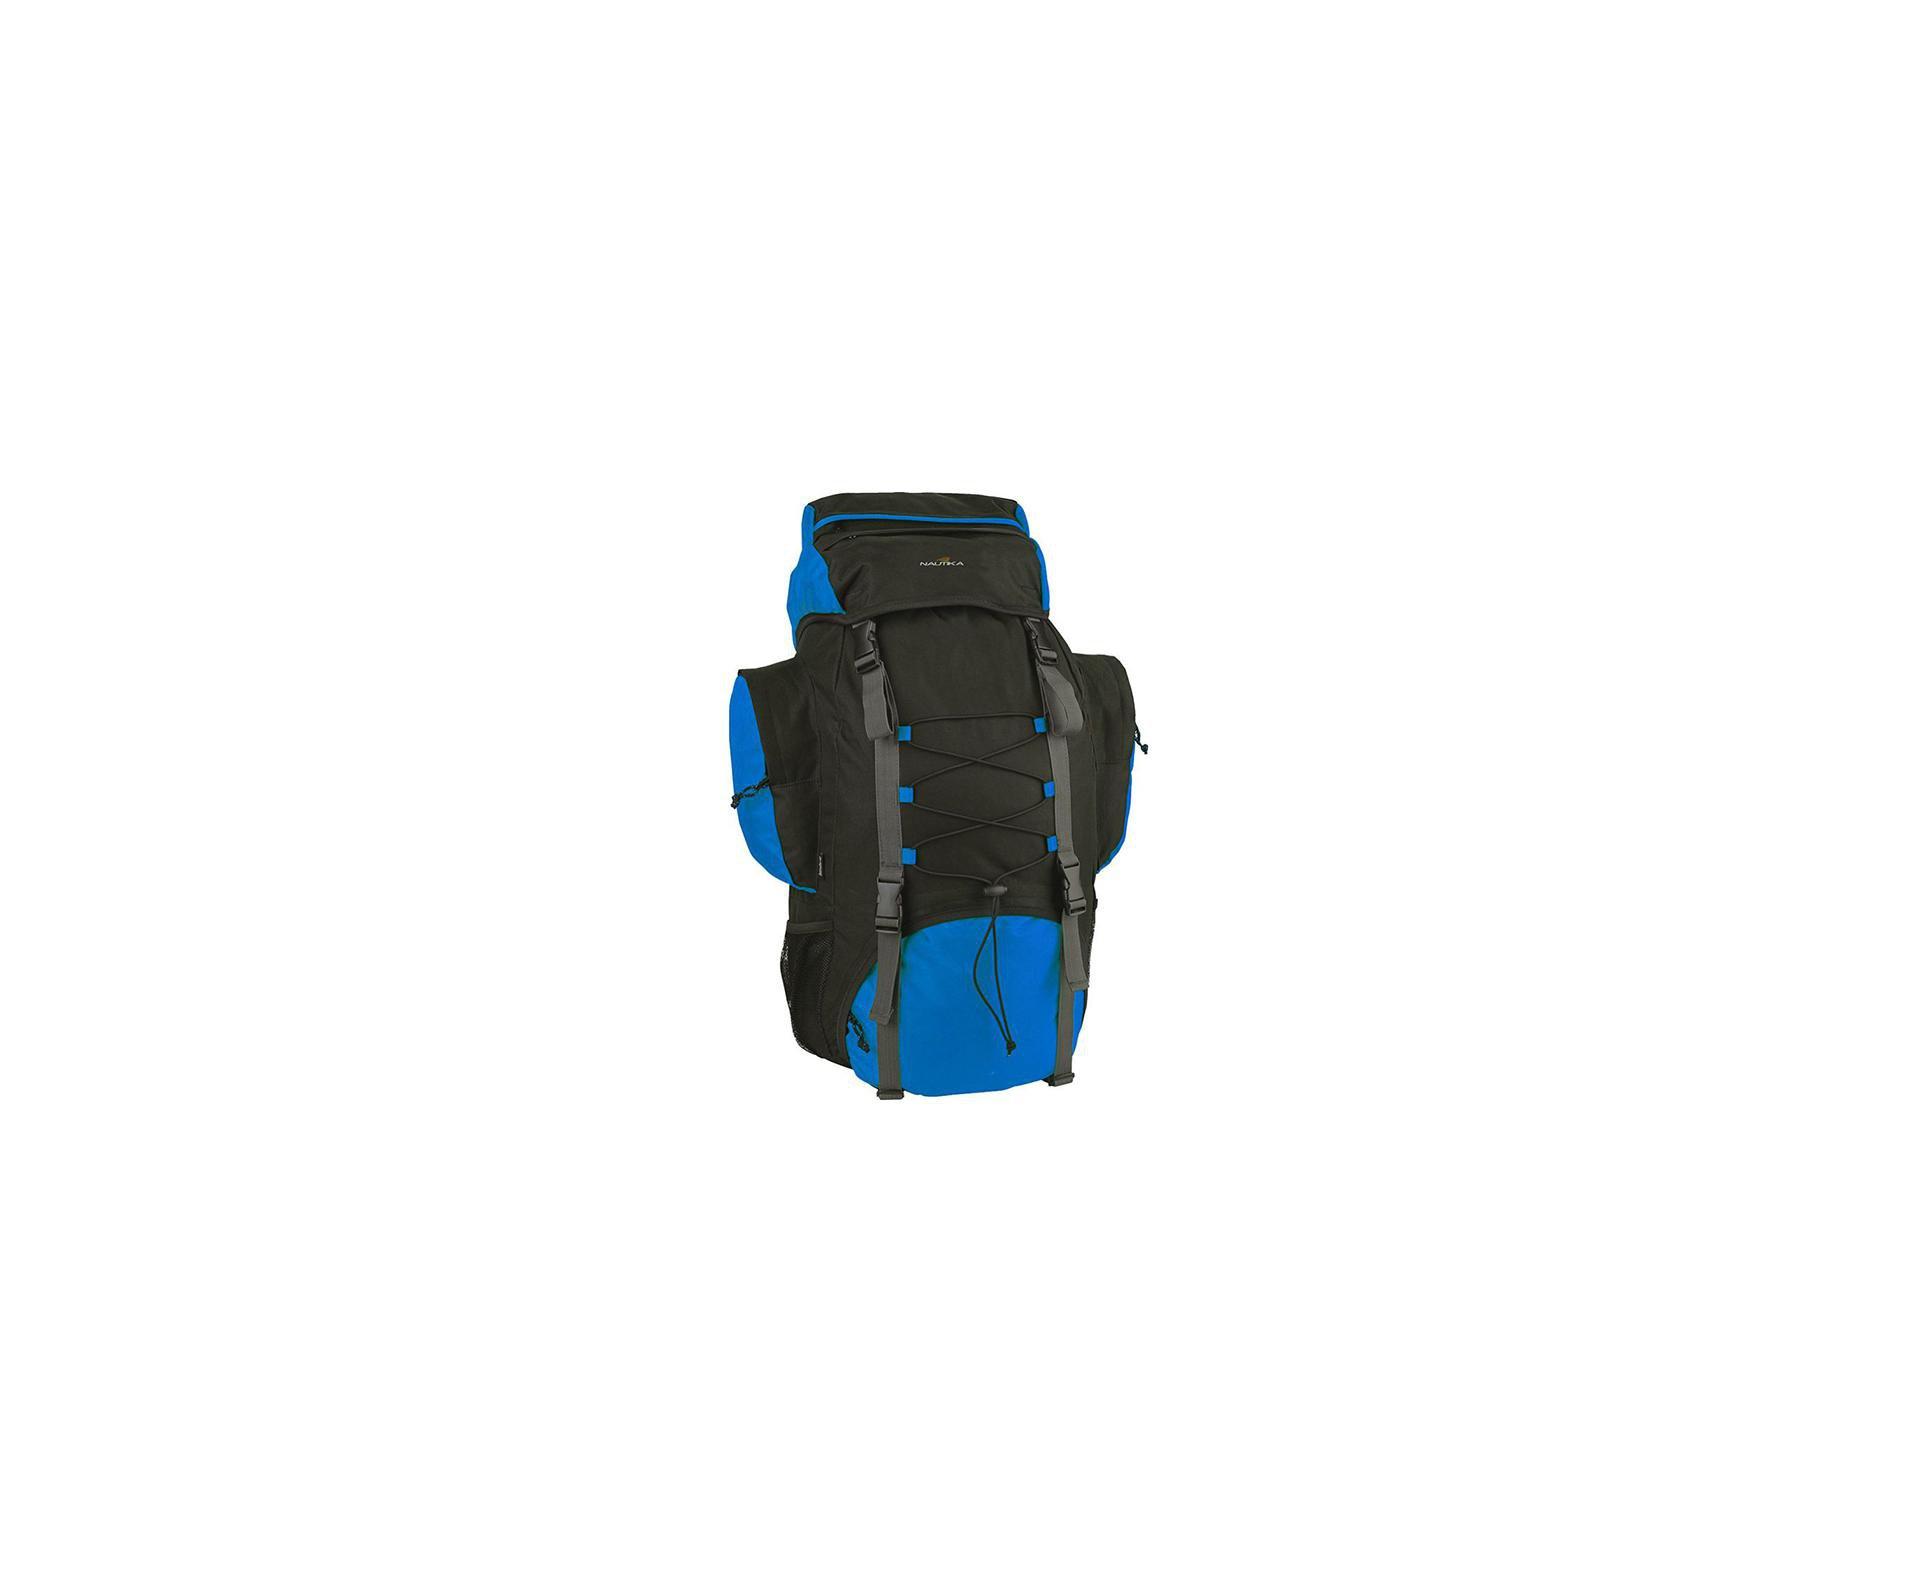 Mochila Intruder 60l Azul/preto - Nautika